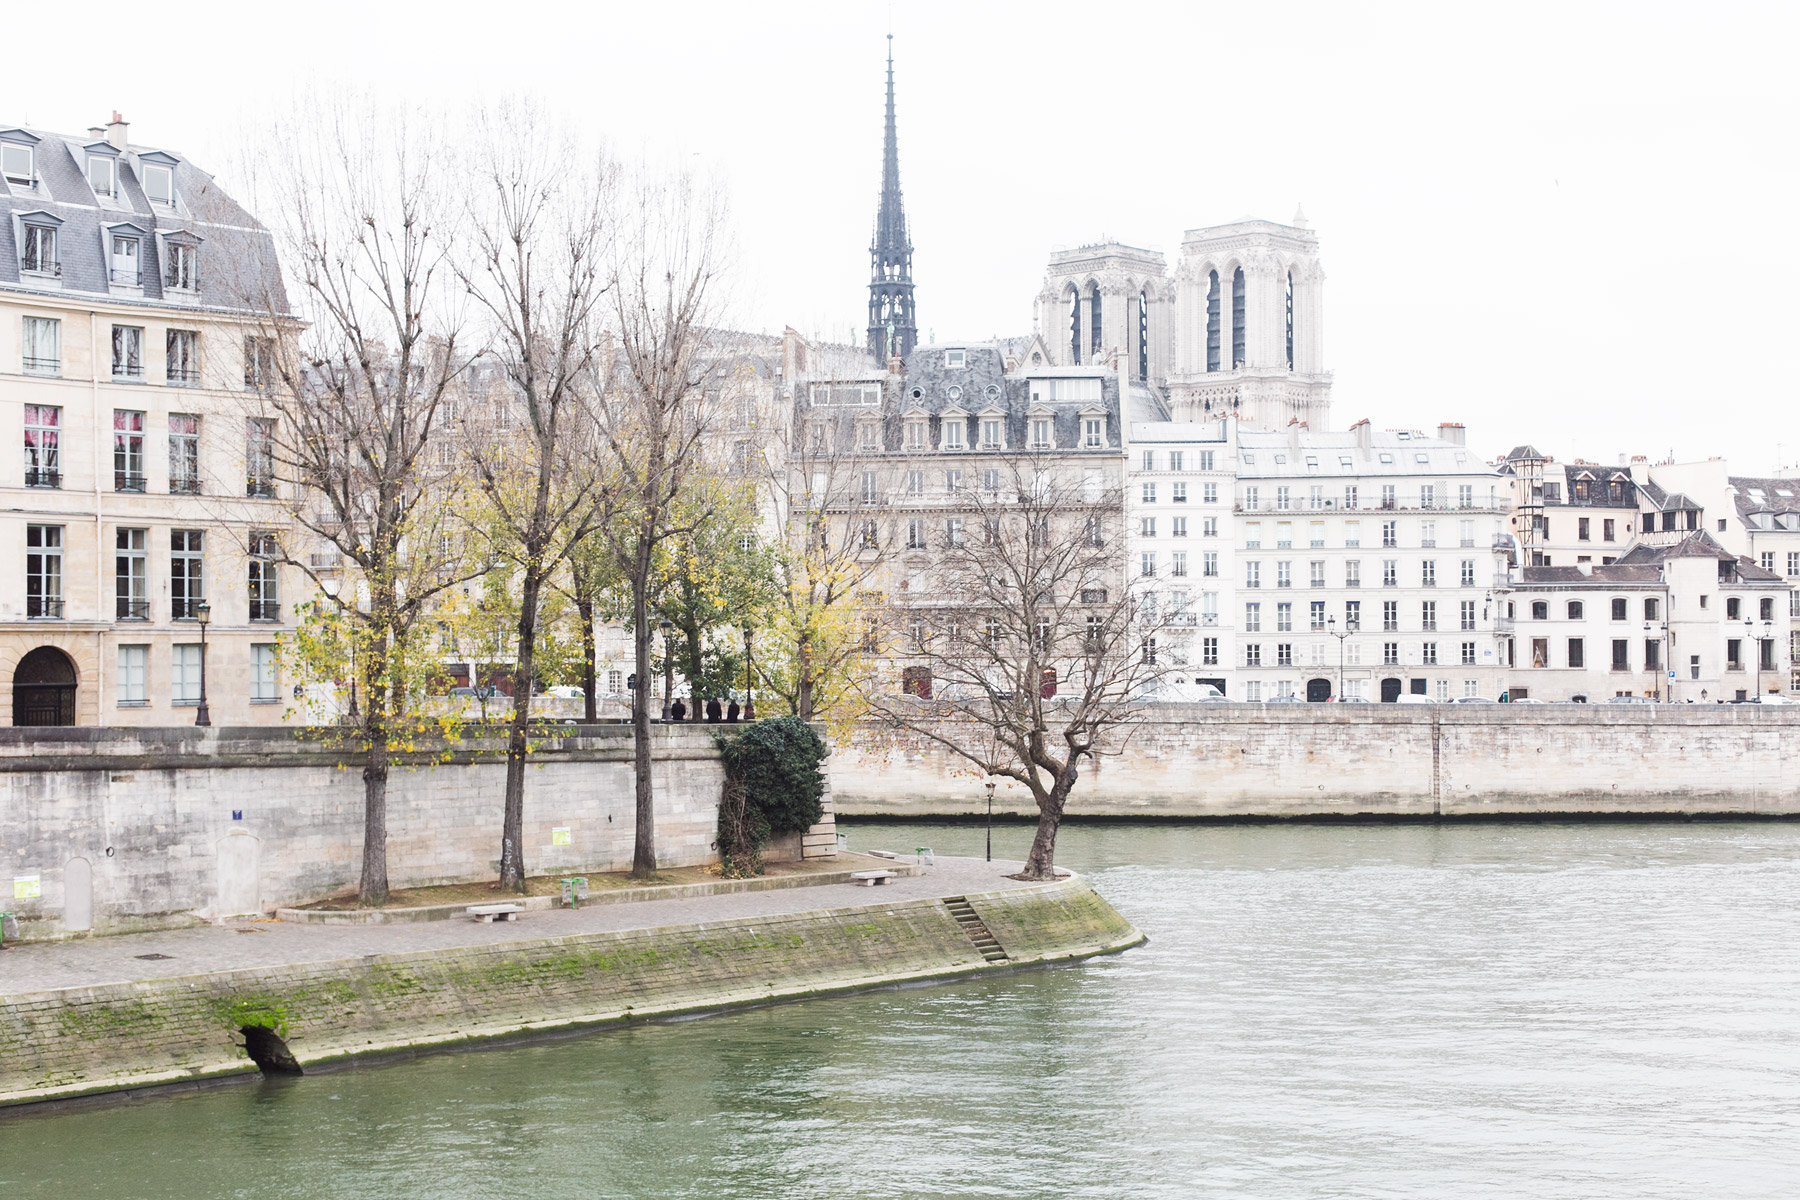 Around the 4th arrondissement